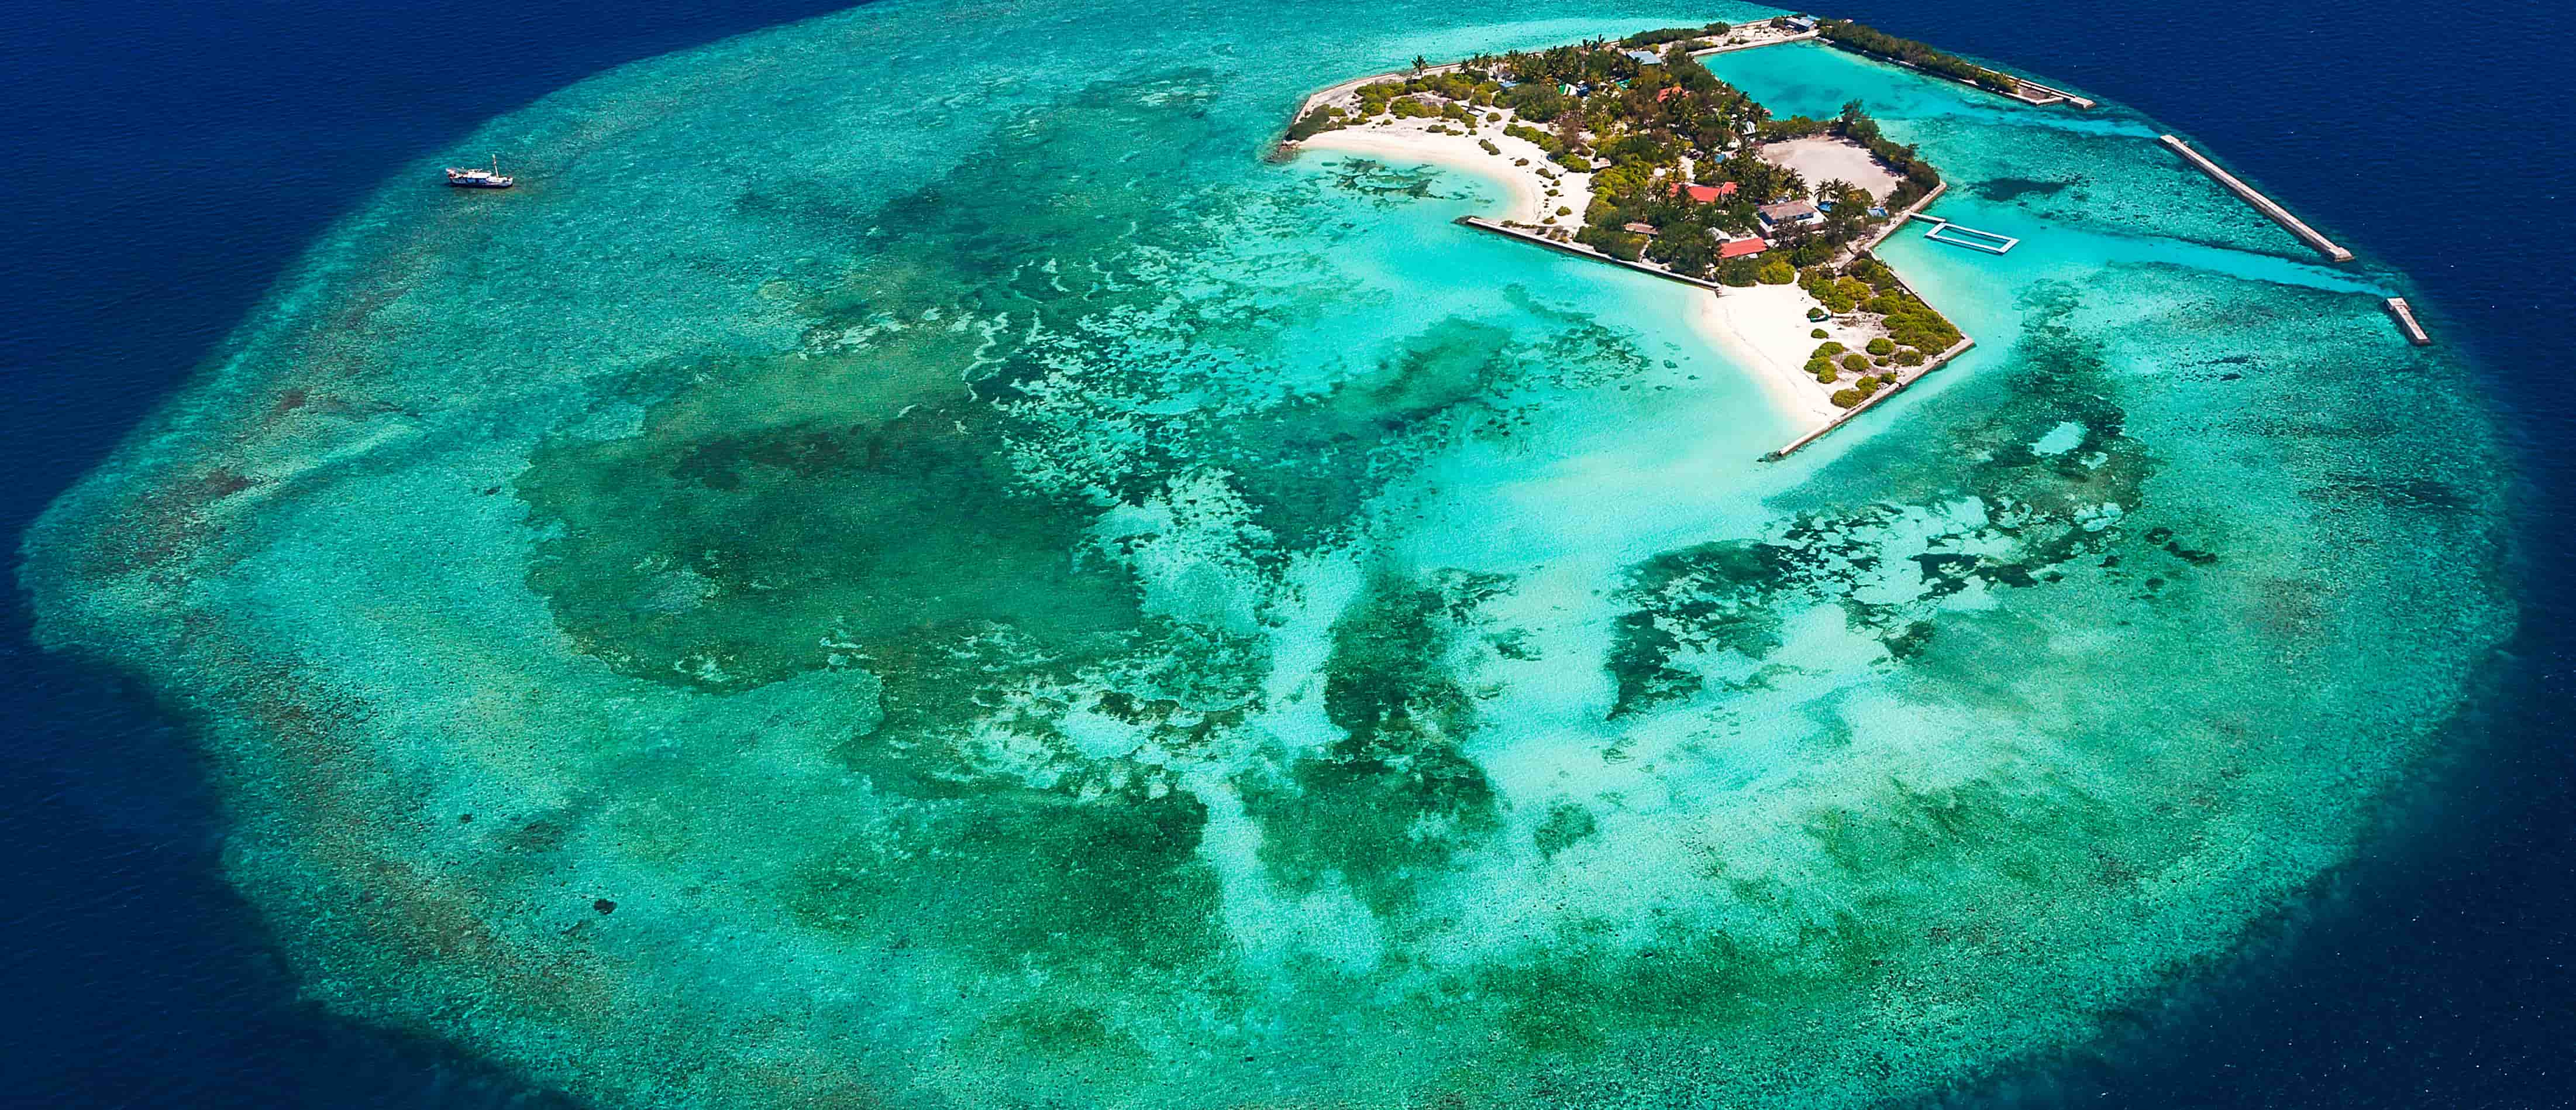 Feydhoo Finolhu island at Male Atoll, Maldives. (Photo: Marco Prosch/Getty Images)